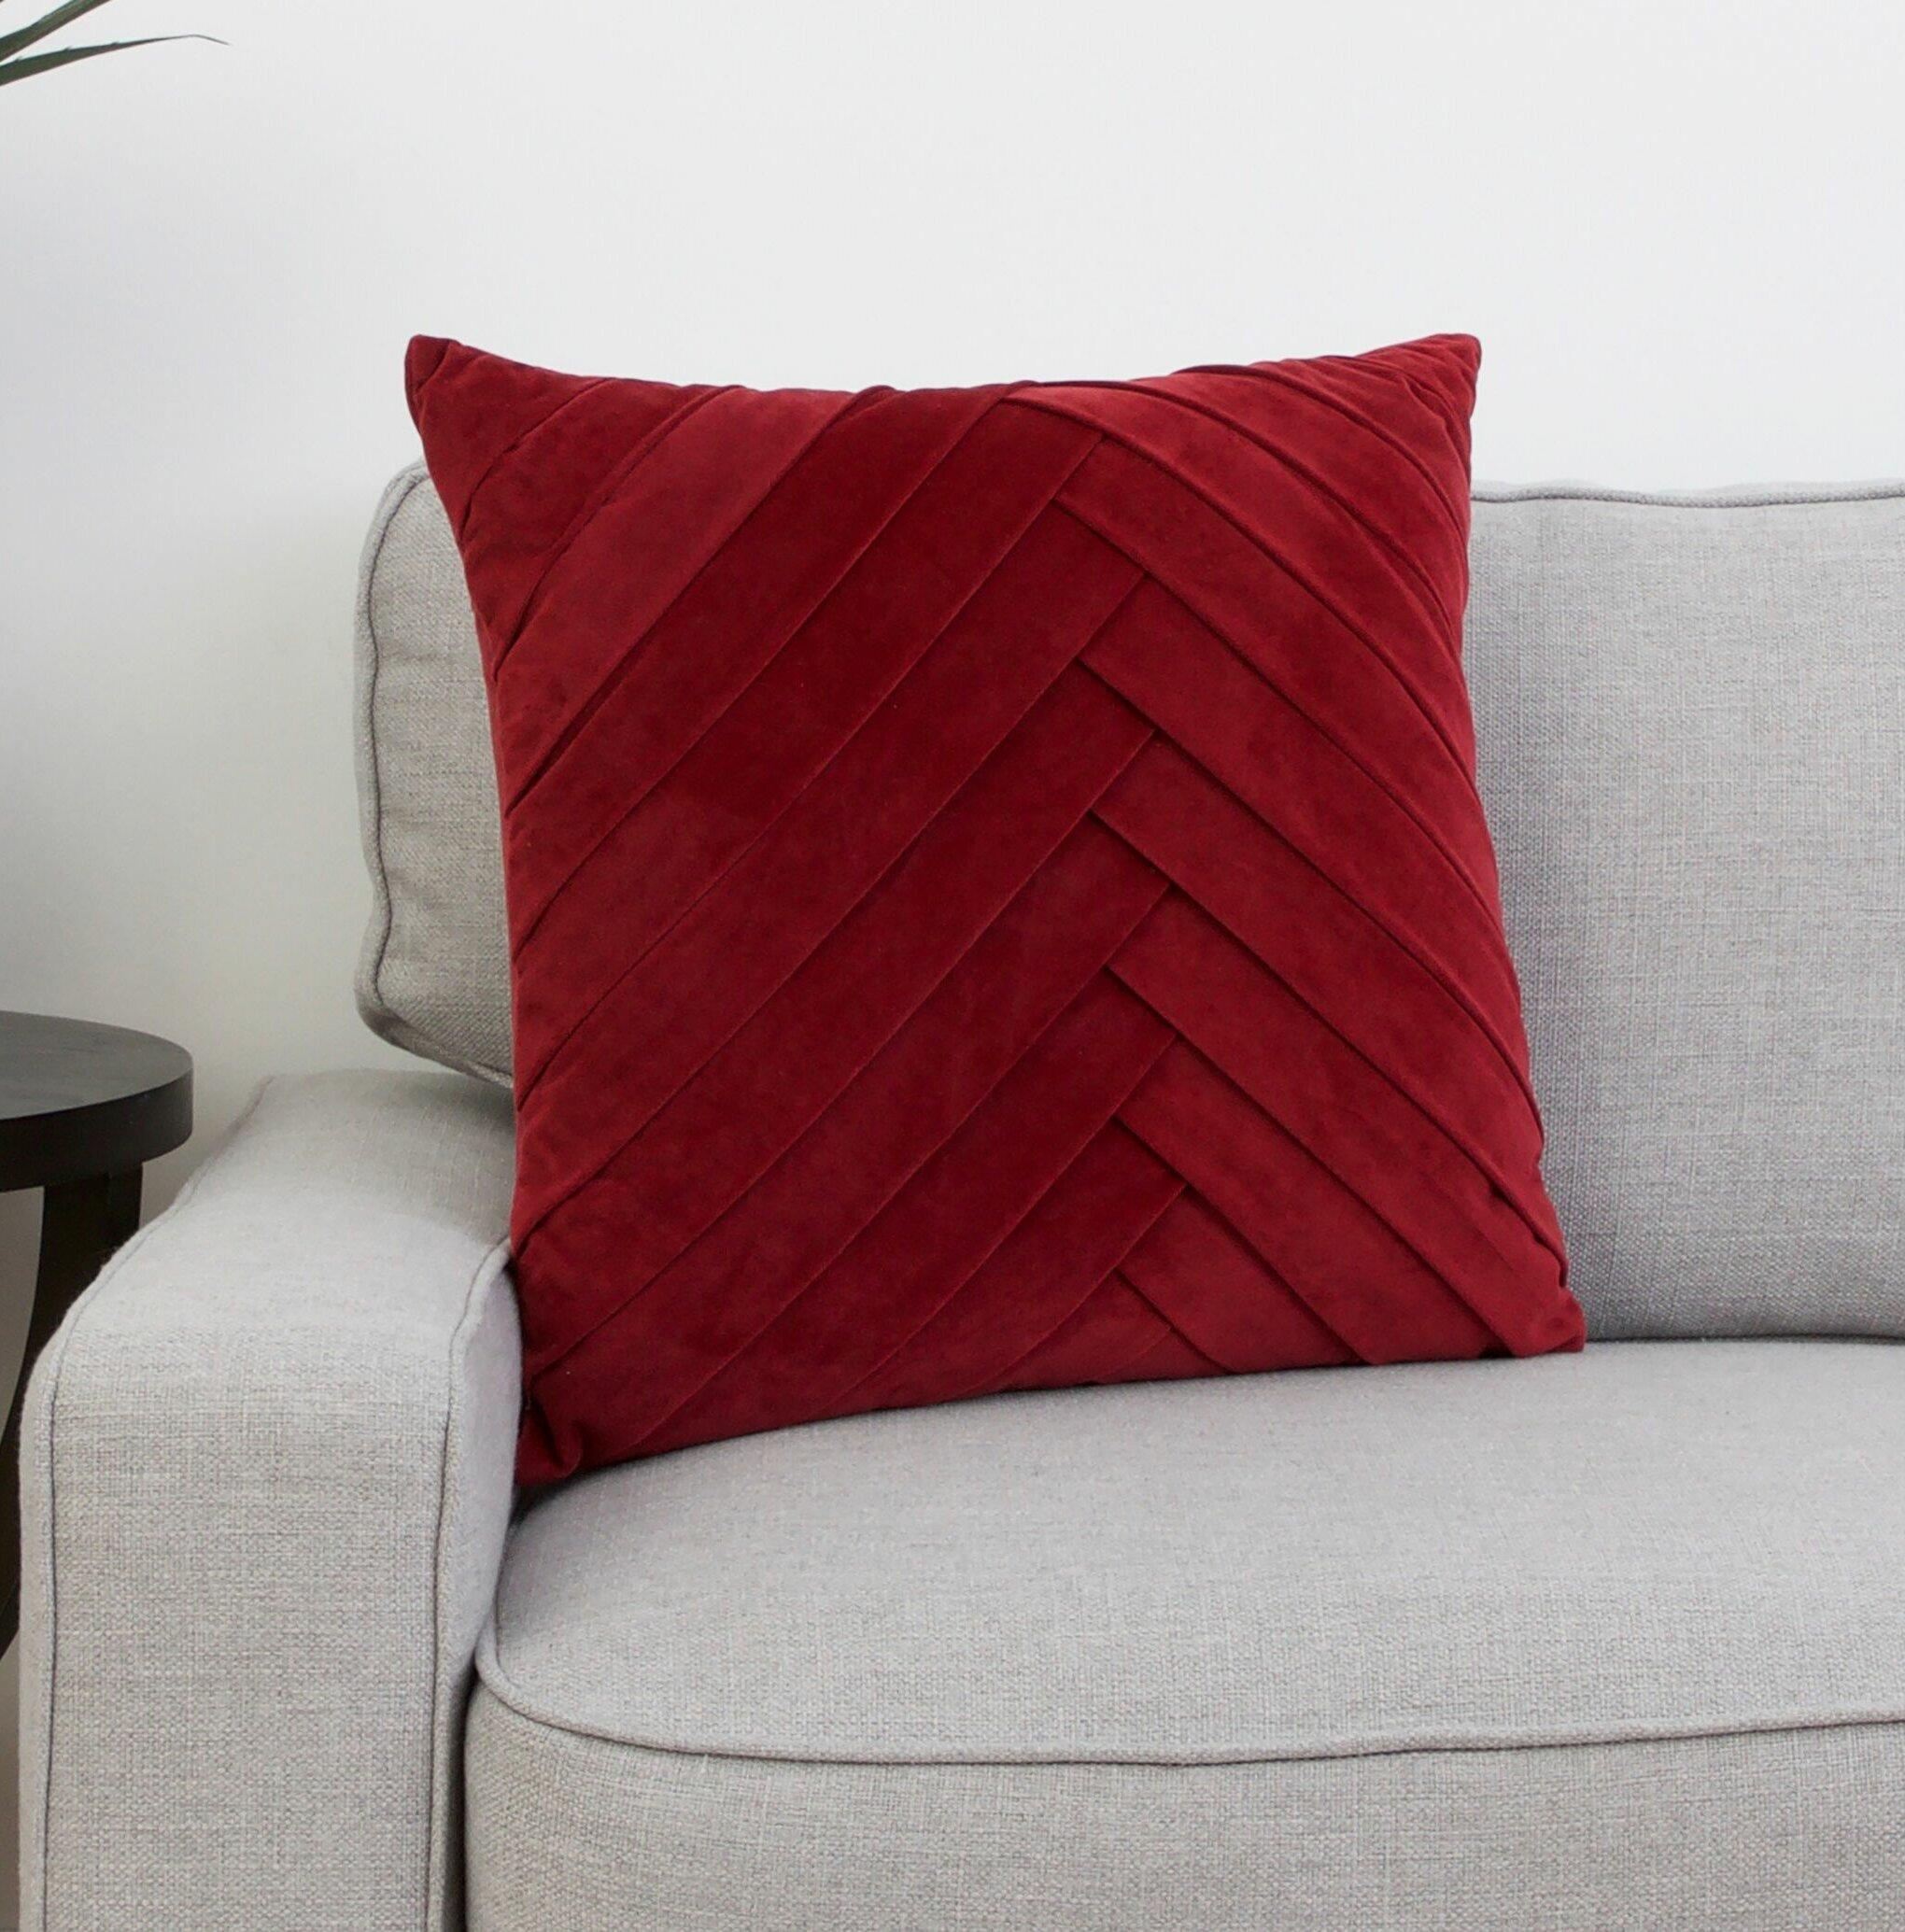 Zipcode Design West Bridgewater Square Pillow Cover & Insert